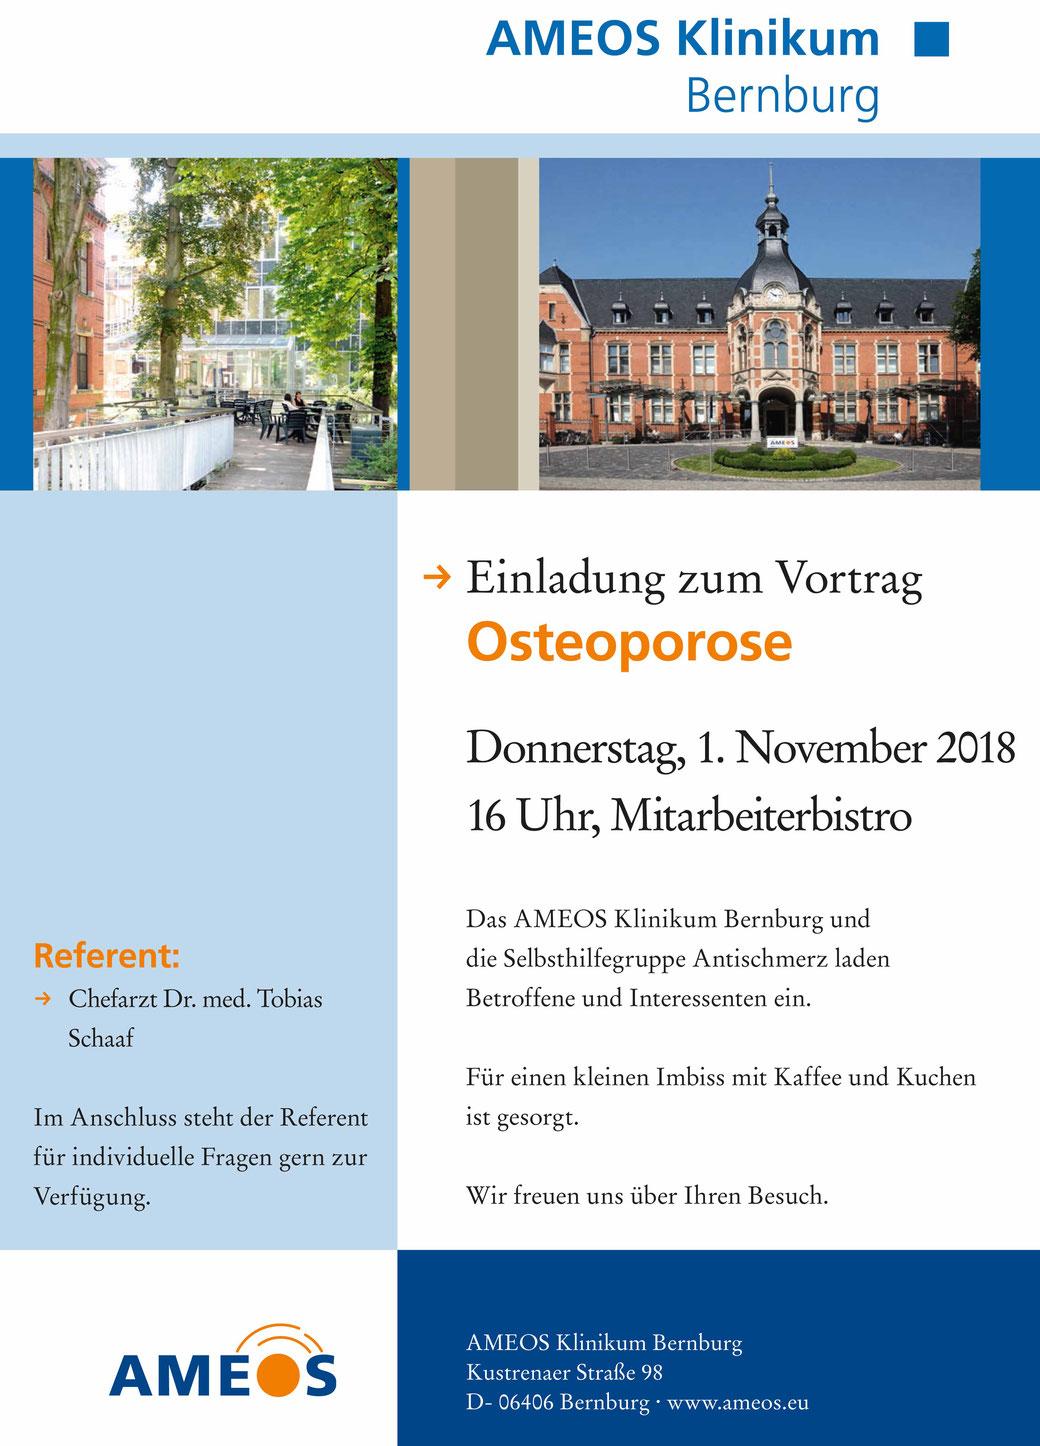 Sanitätshaus Klinz Bernburg Osteoporose Ameos Bernburg